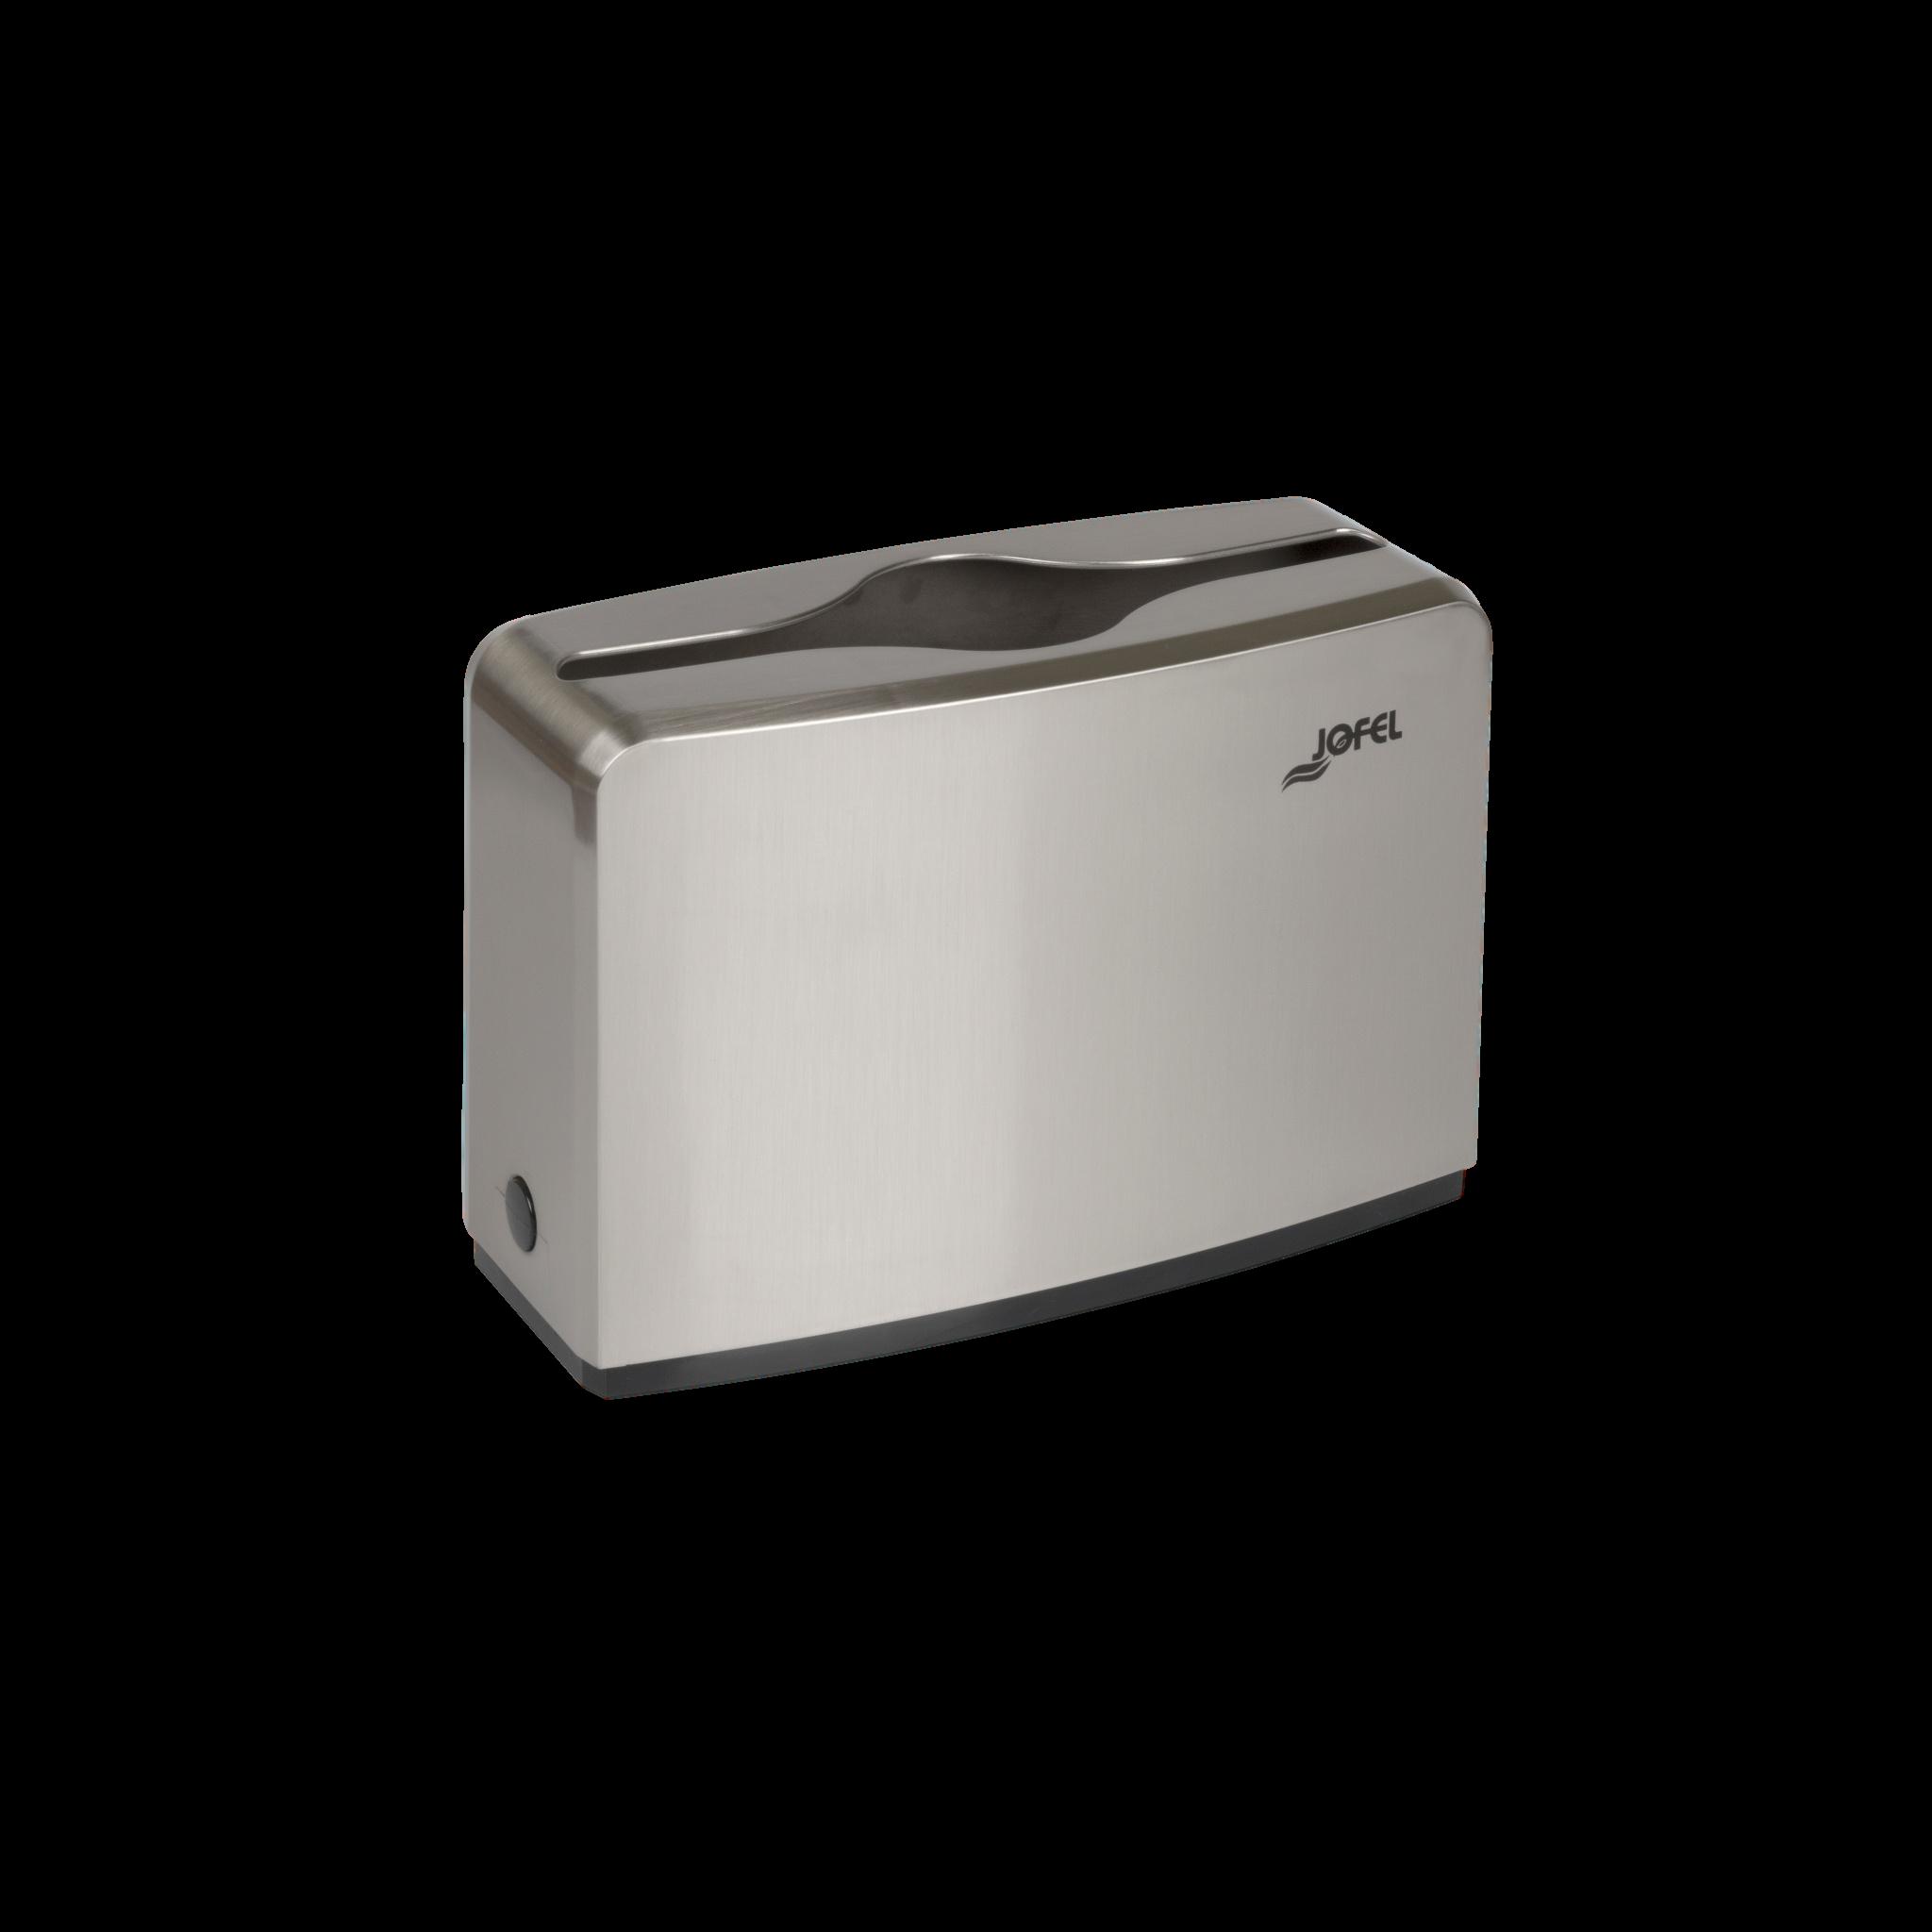 Jofel lehtkätepaberi dosaator, W ja Z, lauapealne, nikkel-plastik, 185x273x118 mm